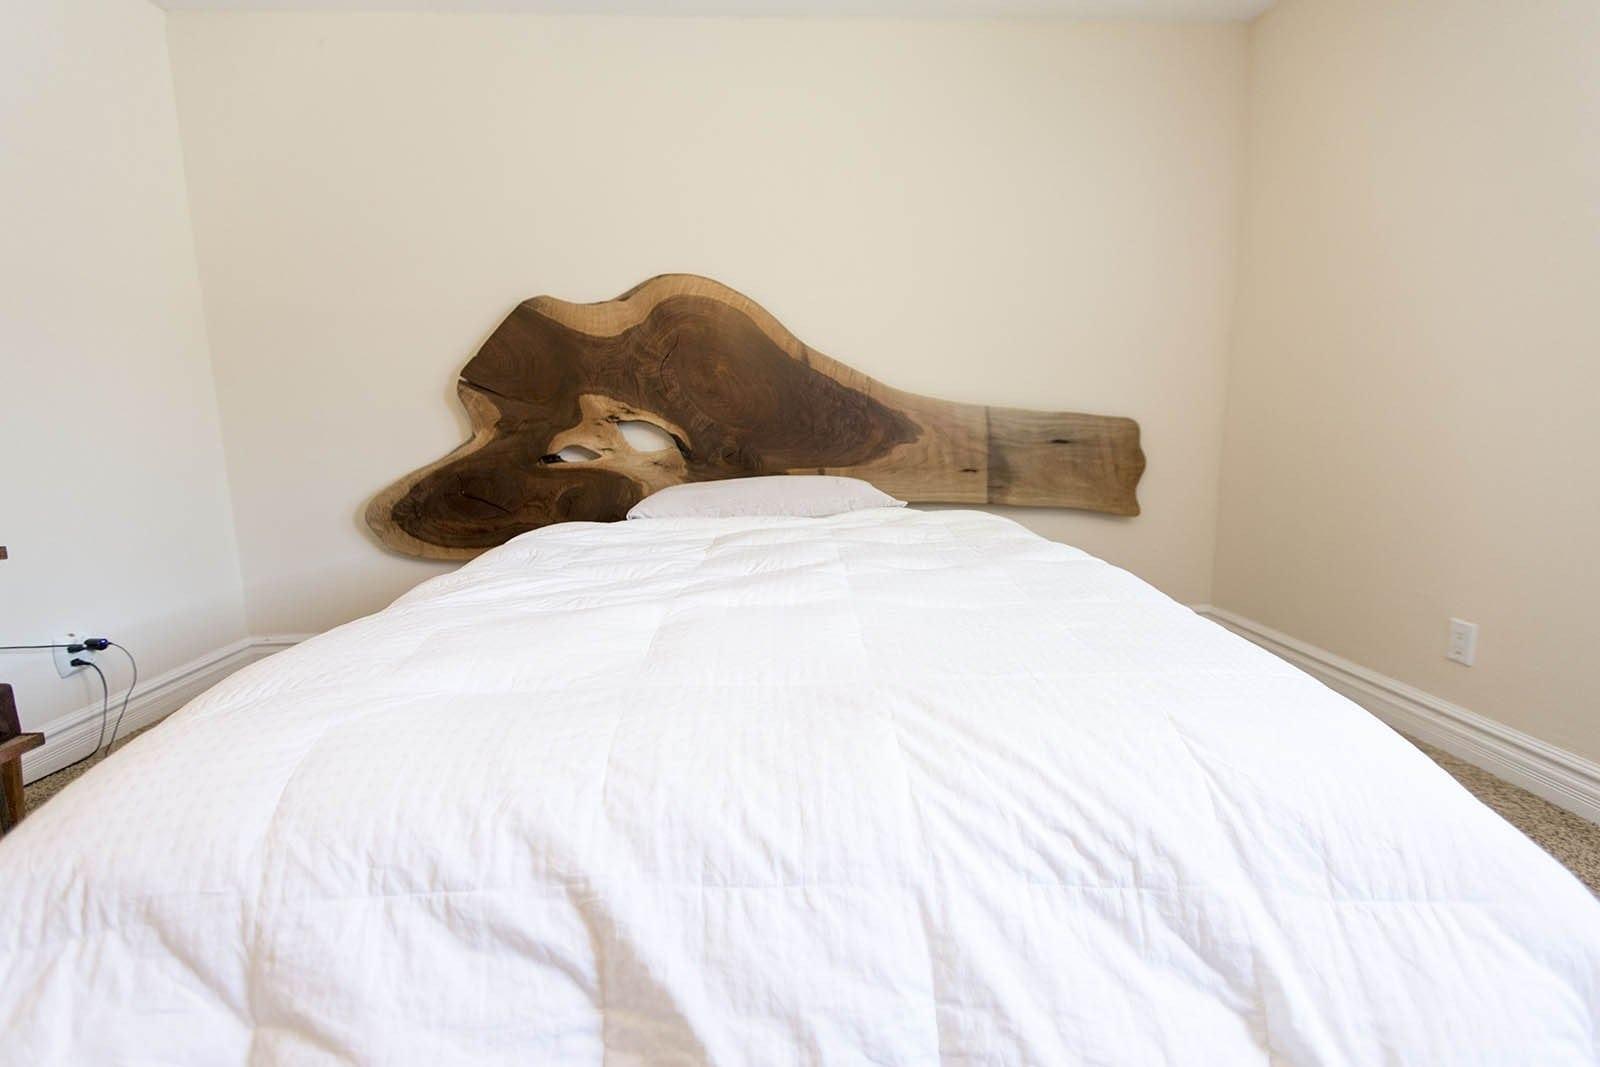 and wall sol thornam mattress le sent d des de trop headboard mount pin hanging cool by printemps co tapis a inspiration